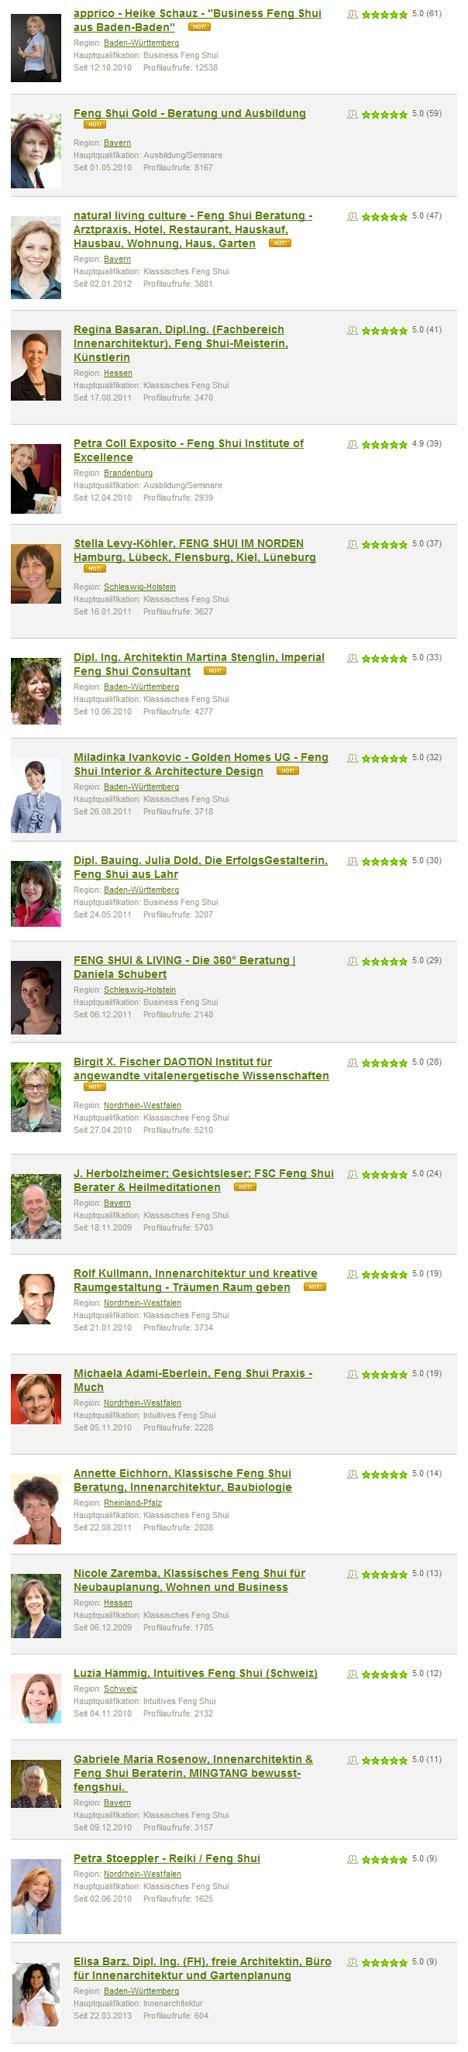 Feng Shui Berater München by Feng Shui Berater Finden Die Top Experten Der Branche